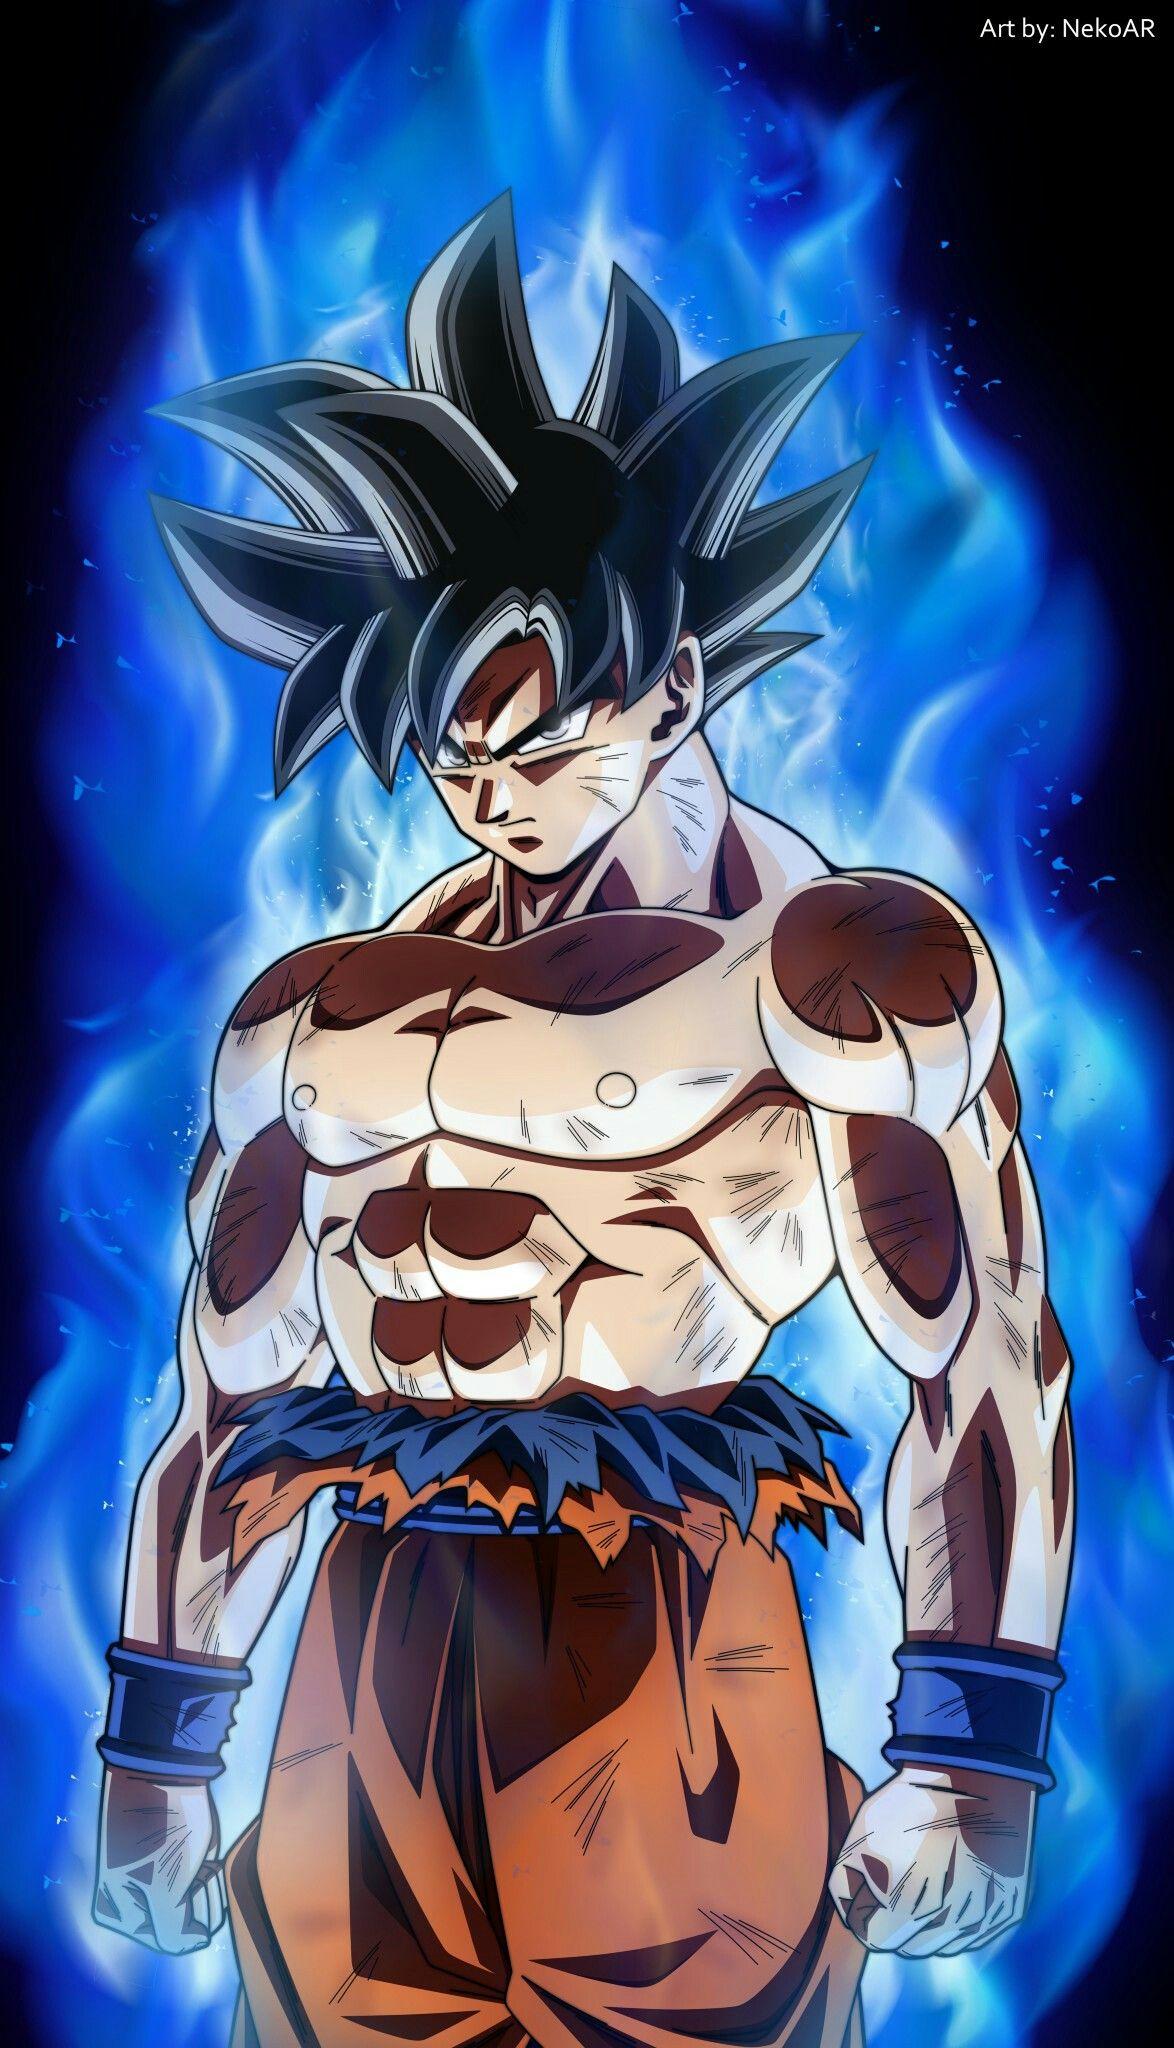 Son Goku Limit Breaker New Form Anime Imagem De Anime Vegito Vs Zamasu